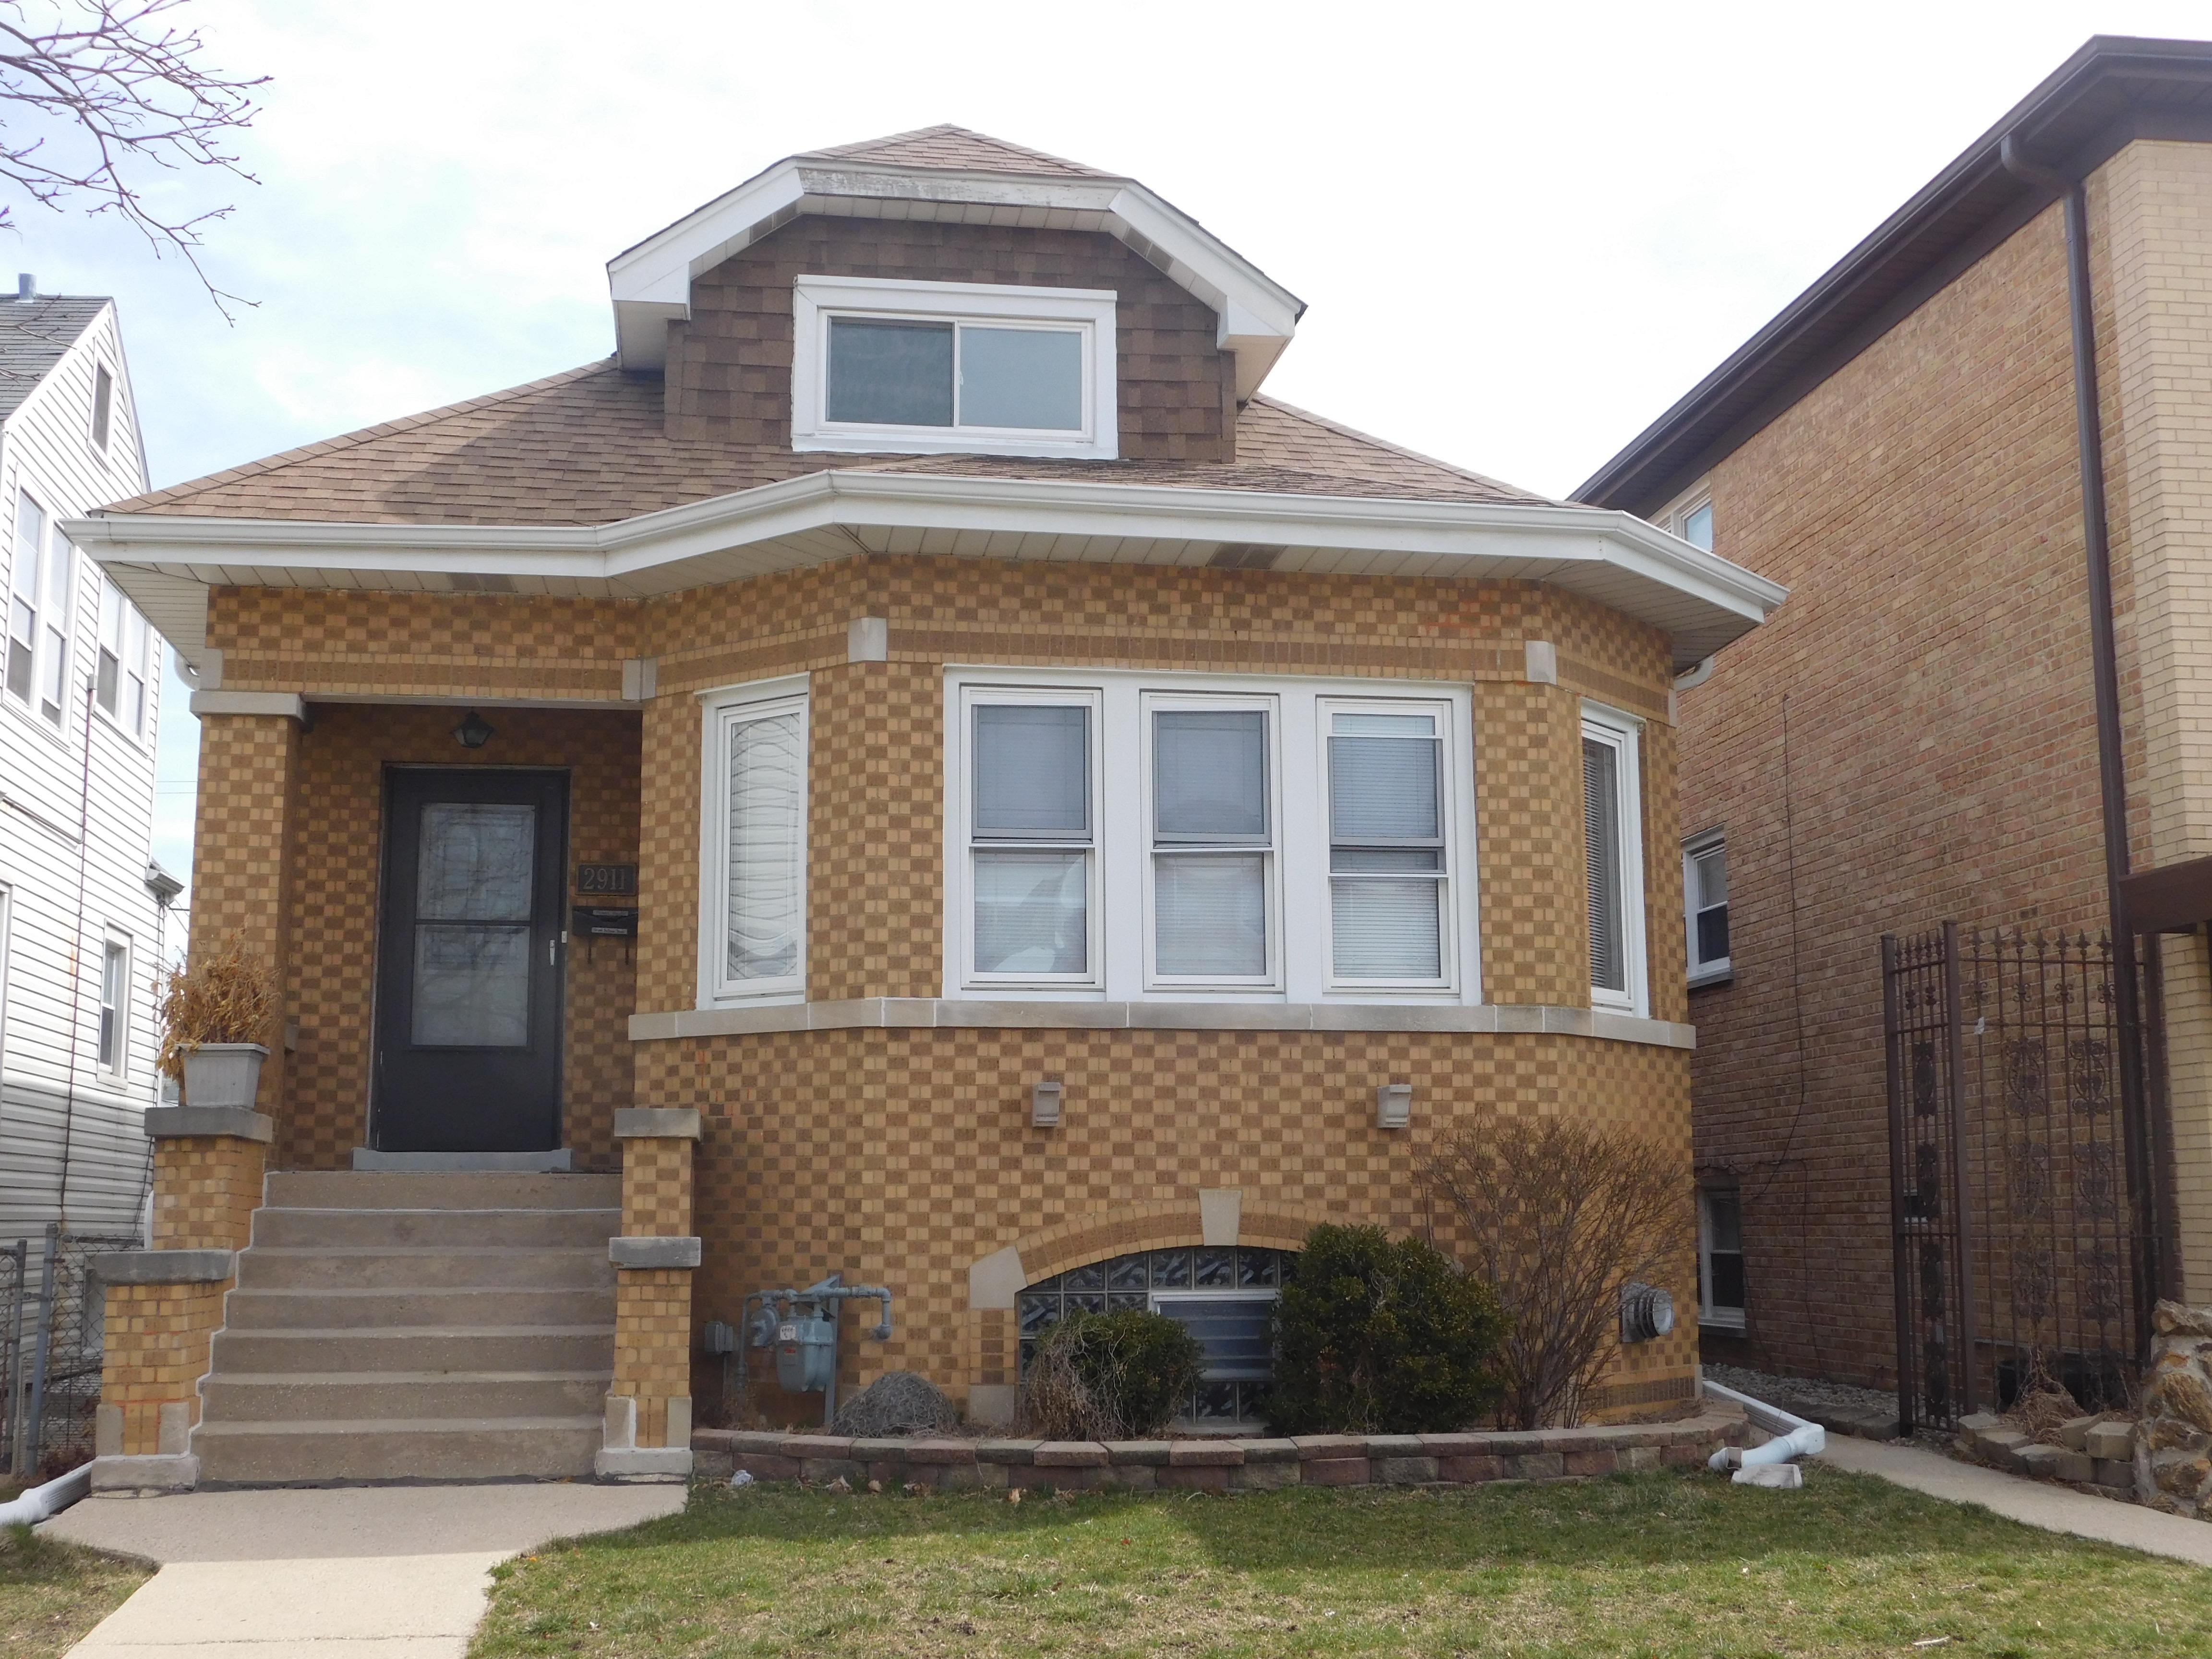 Photo of 2911 N 75th Ave, Elmwood Park, IL, 60707